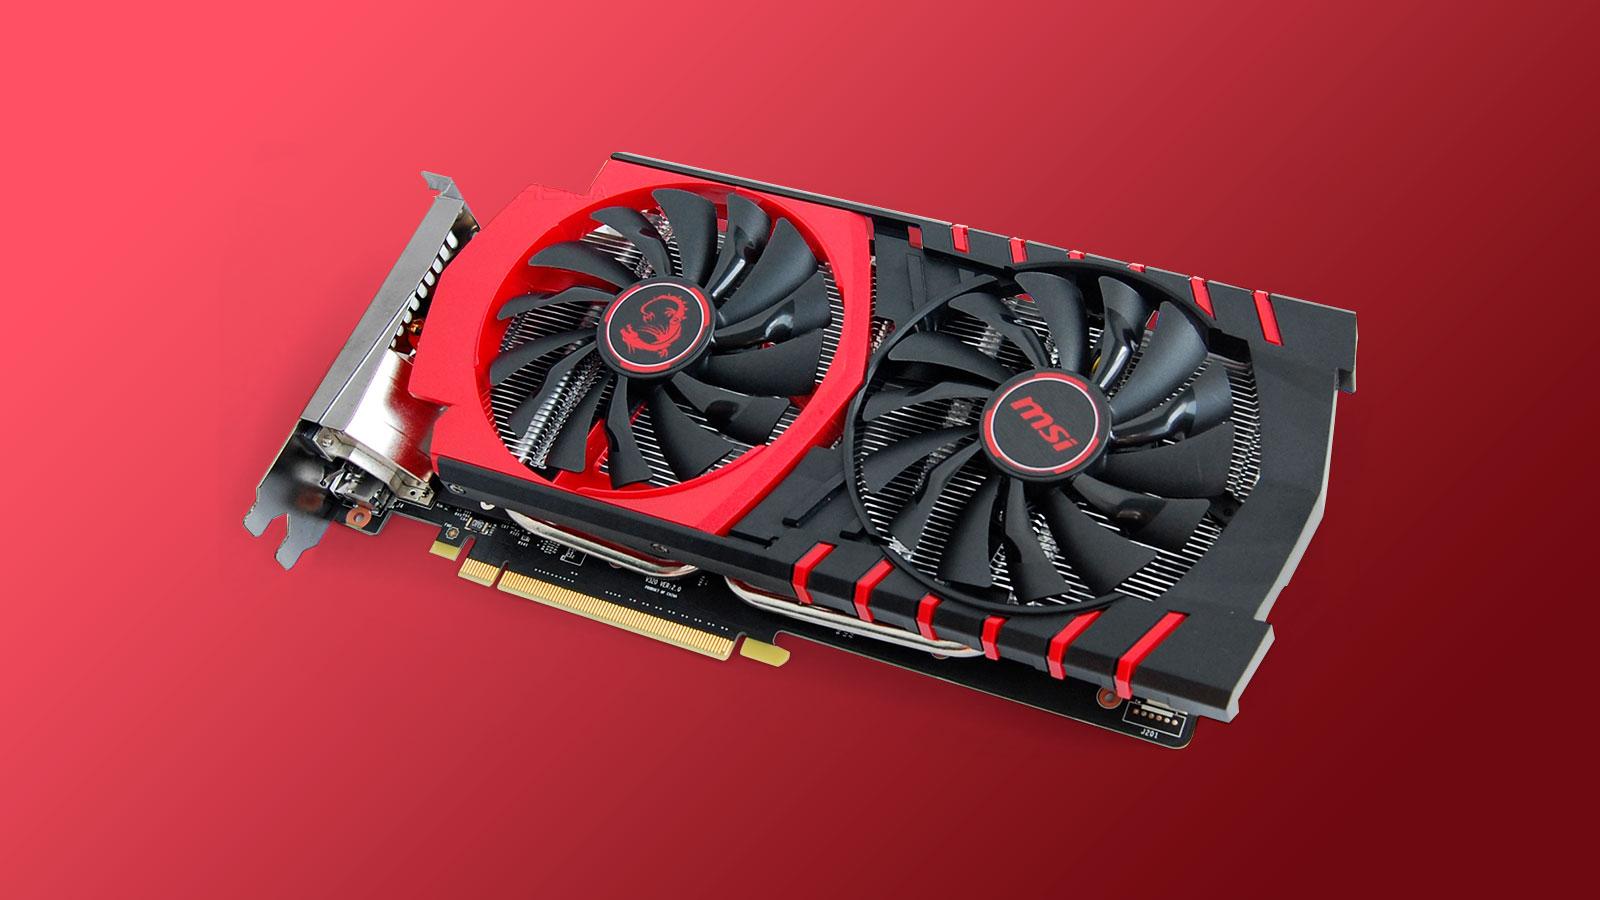 NVIDIA GeForce GTX 950 2G